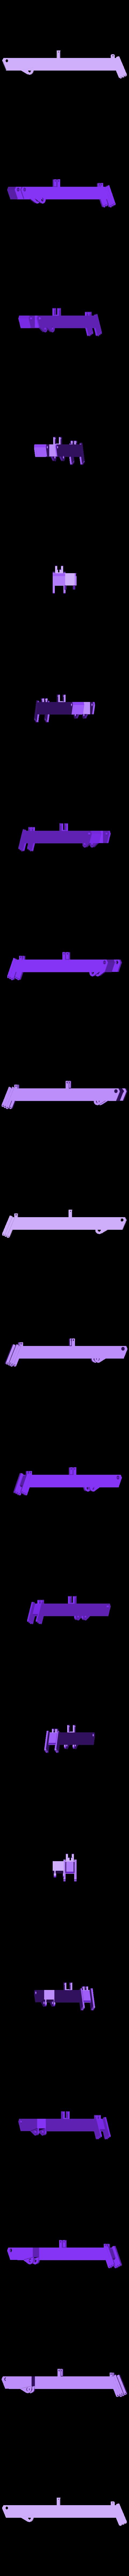 G bras3.STL Download STL file Draisine Matisa for LGB • 3D printable object, biddle